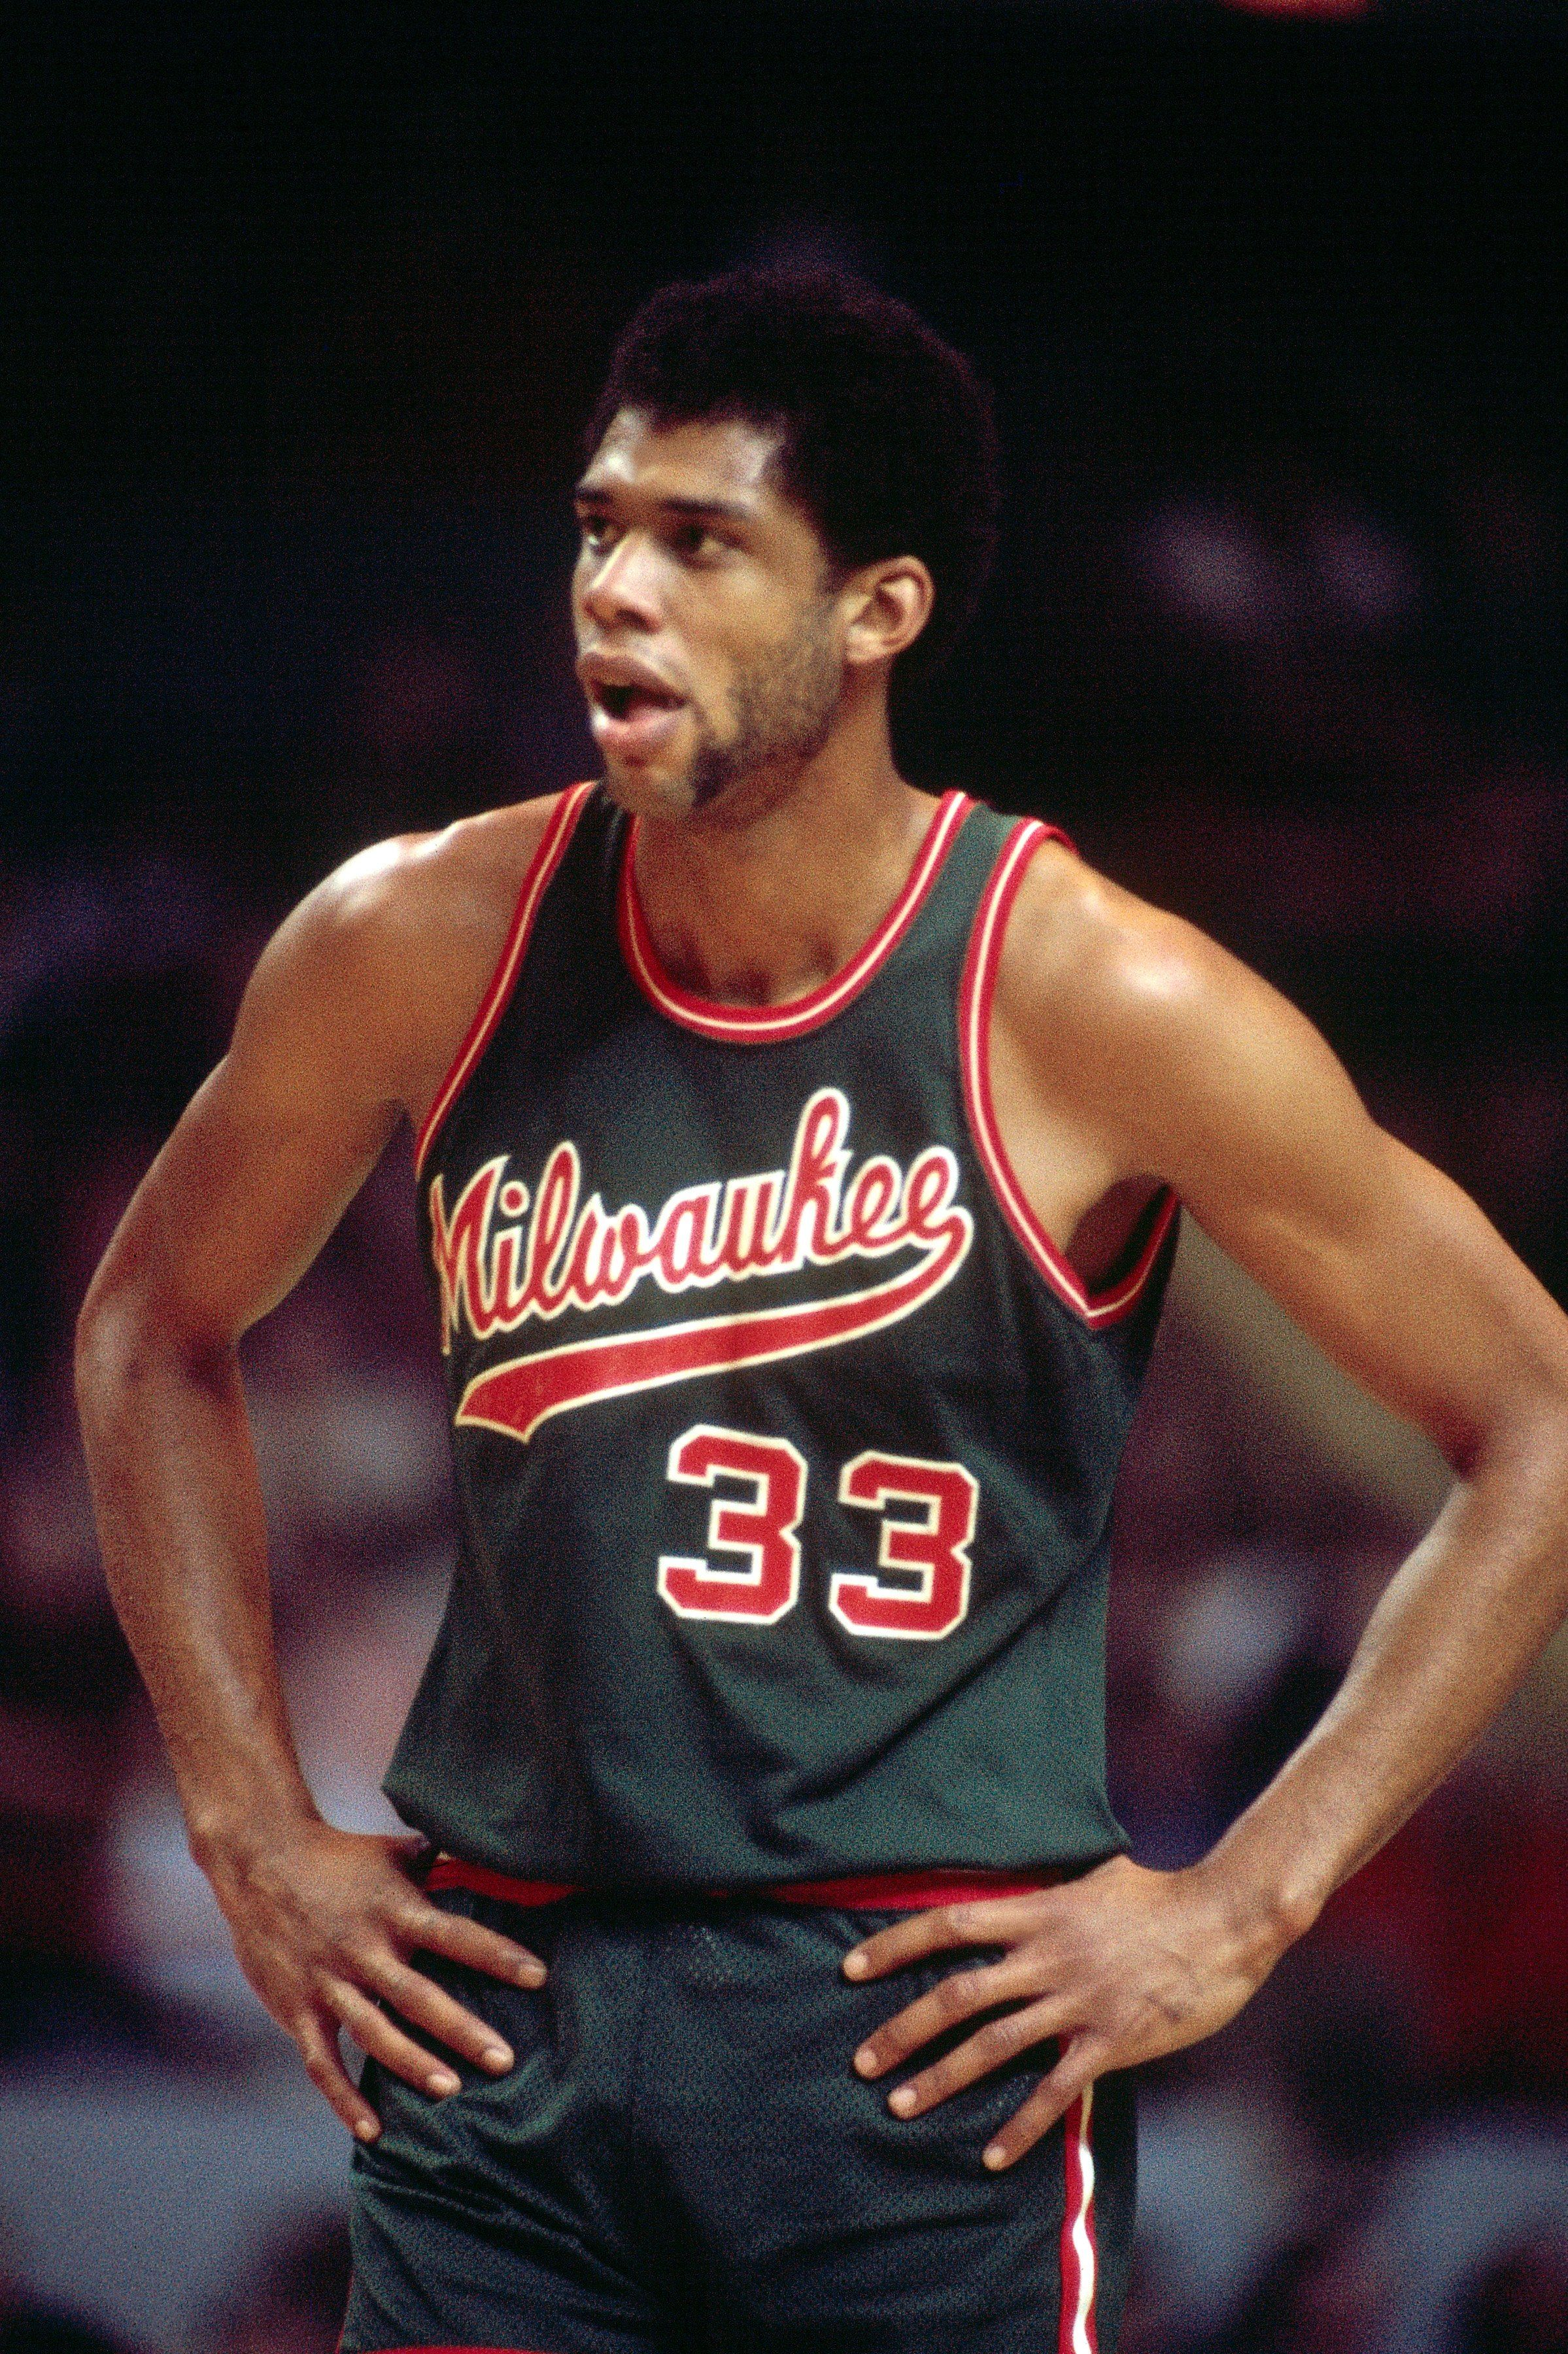 half off 3cddf 3dae3 Kareem Abdul-Jabbar Milwaukee Bucks Canter | NBA Legends ...